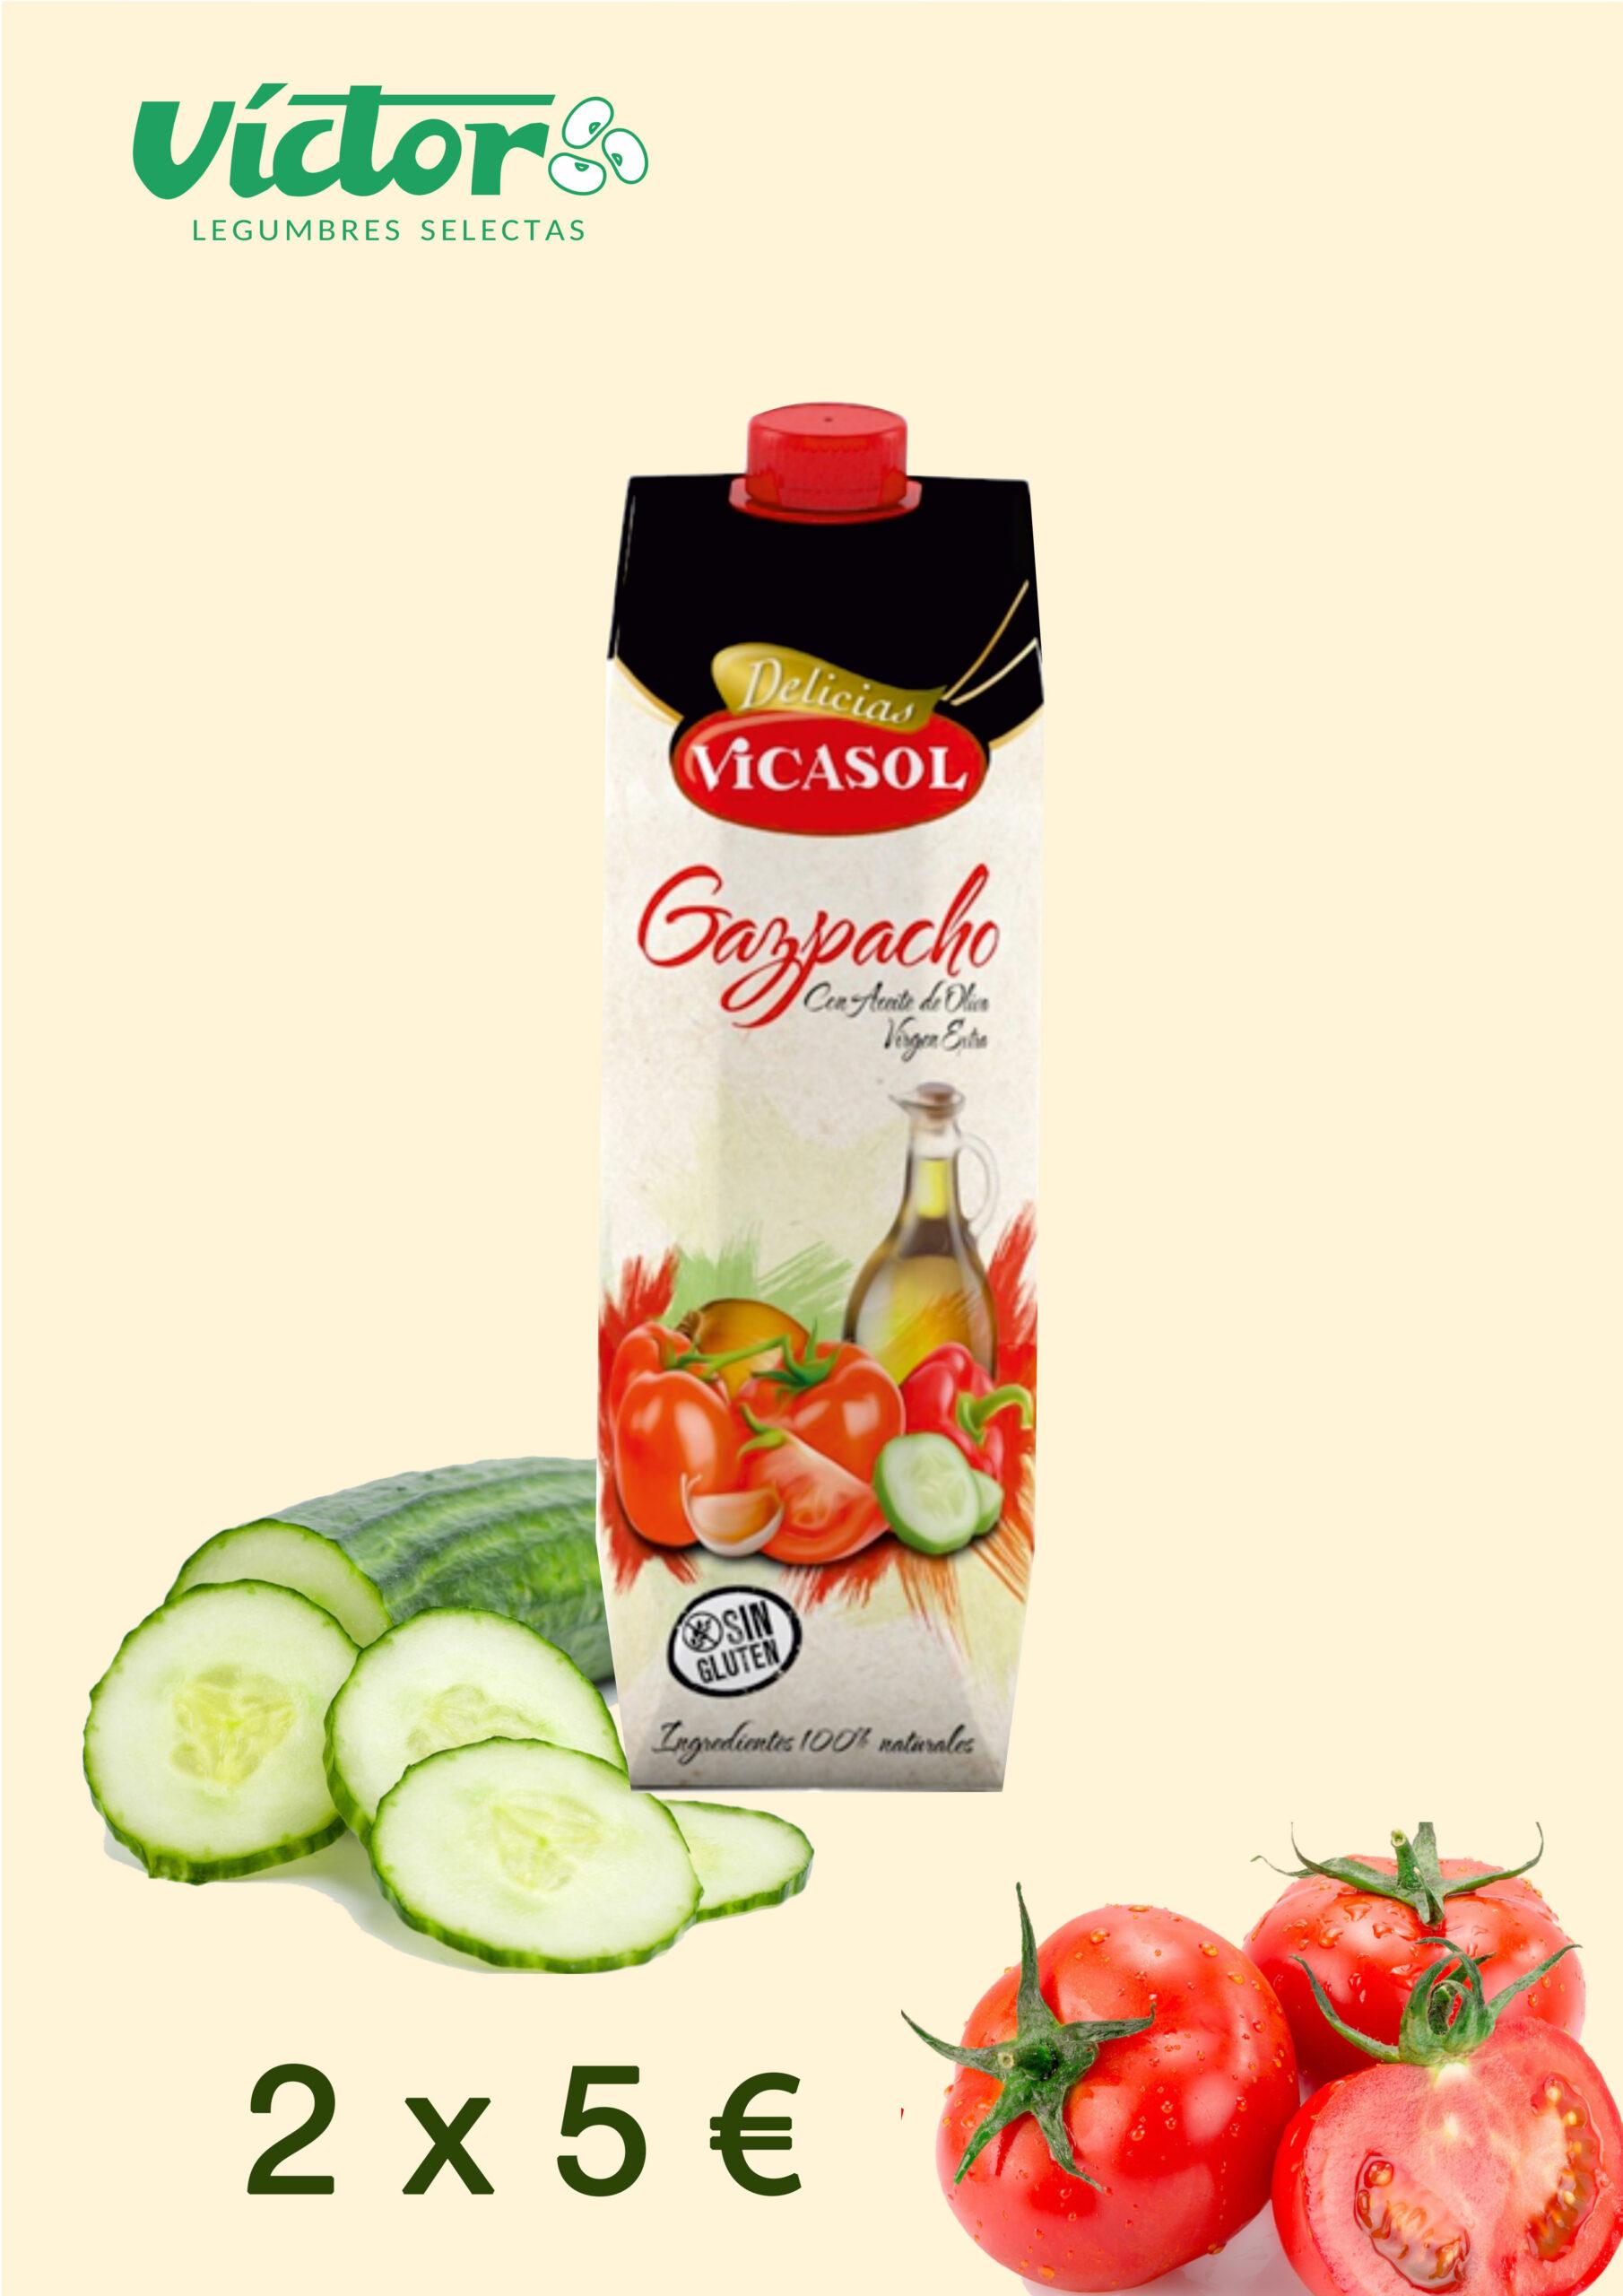 Nuevo Gazpacho 100% Natural